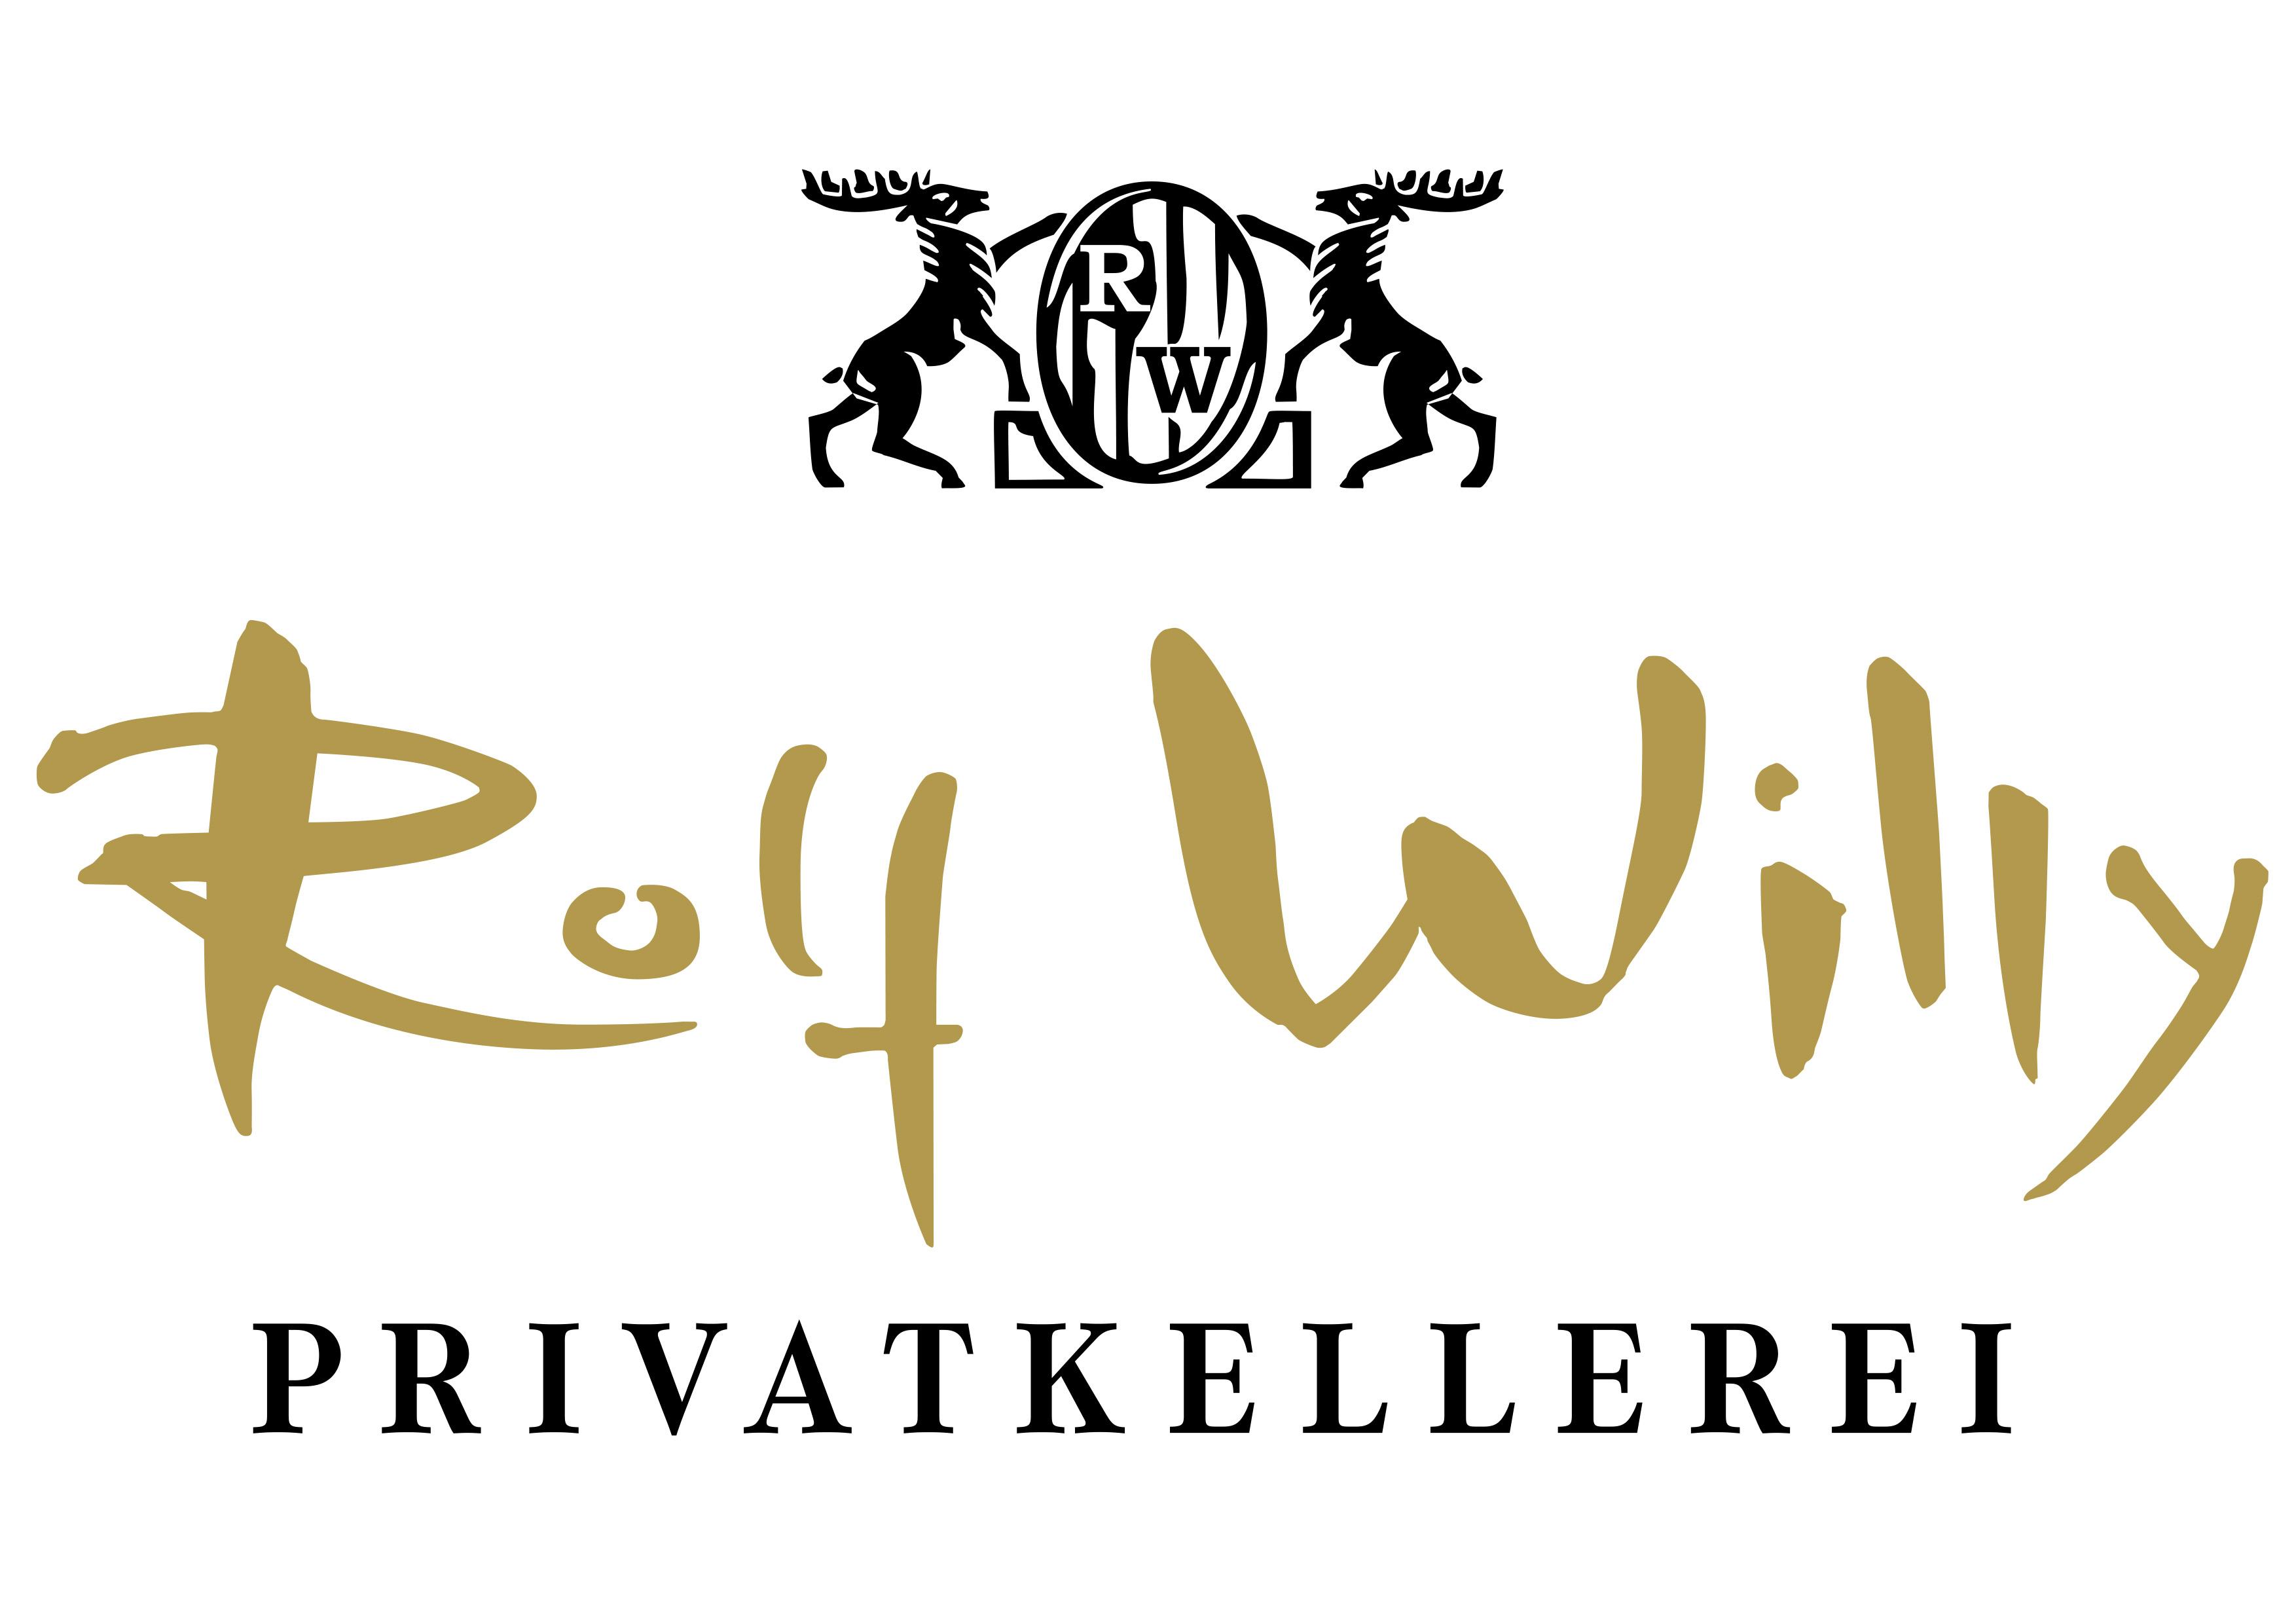 Privatkellerei Rolf Willy